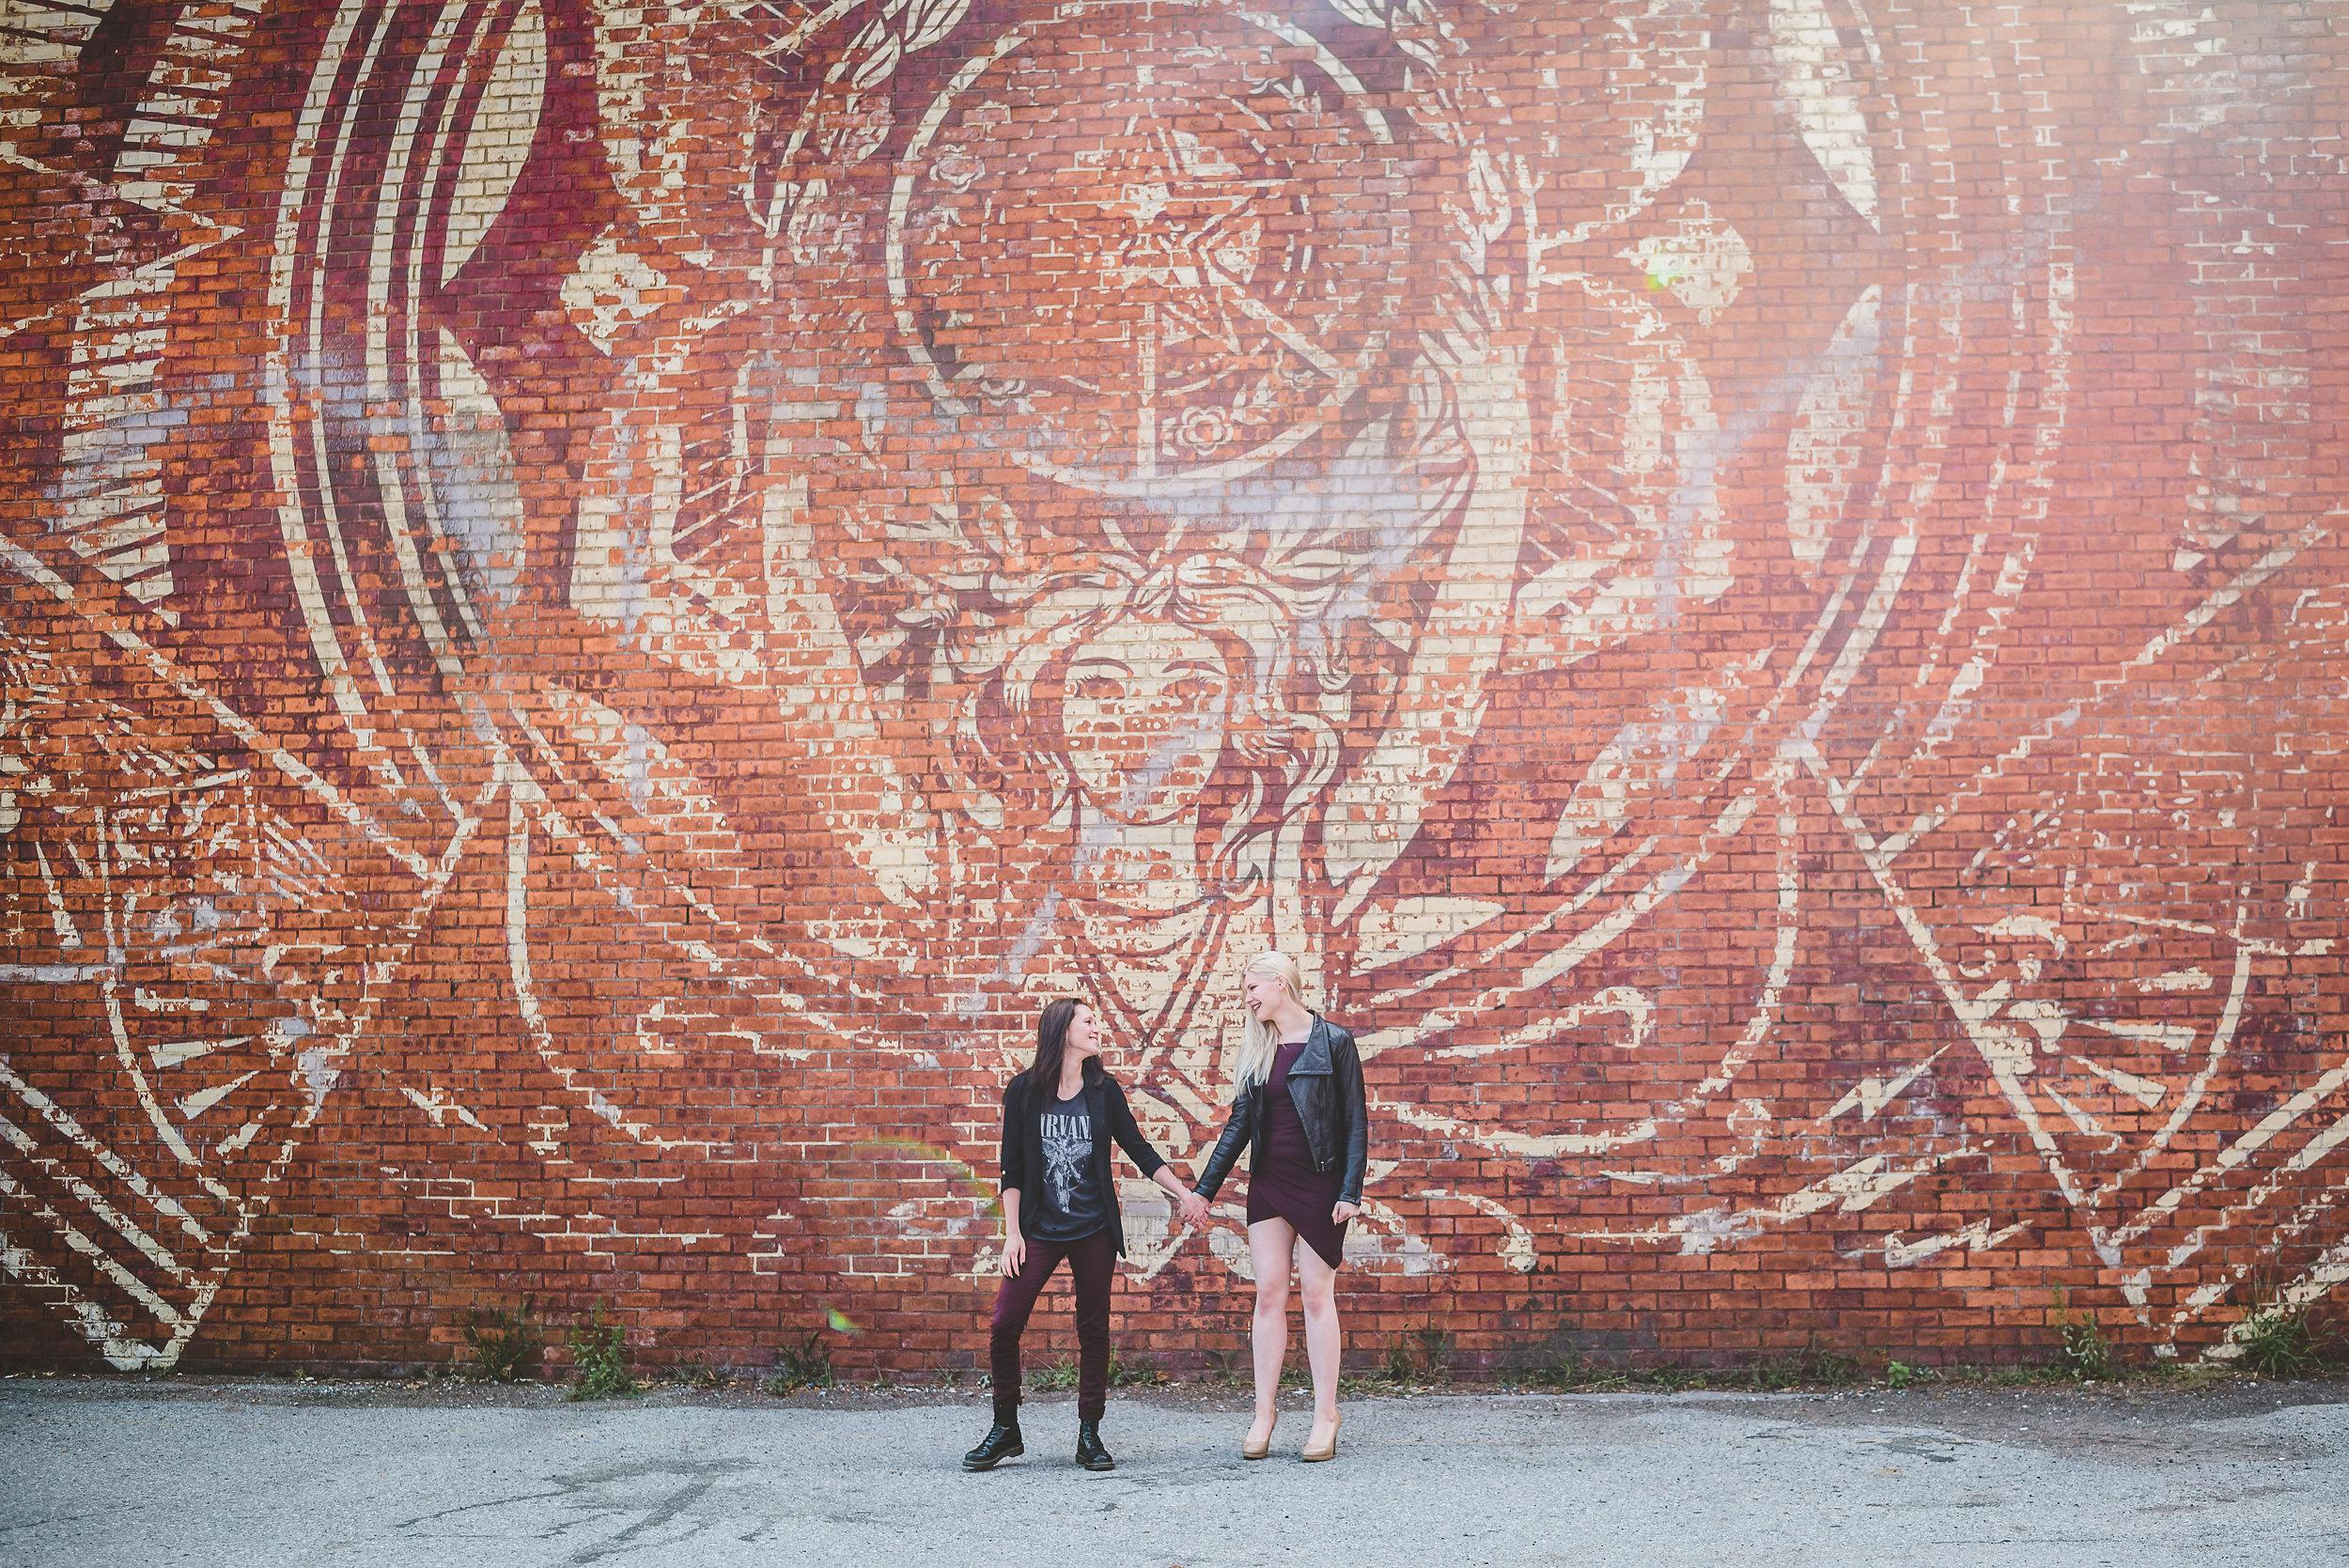 Alexa&Emily Dumbo NYC Couples Session (1).JPG